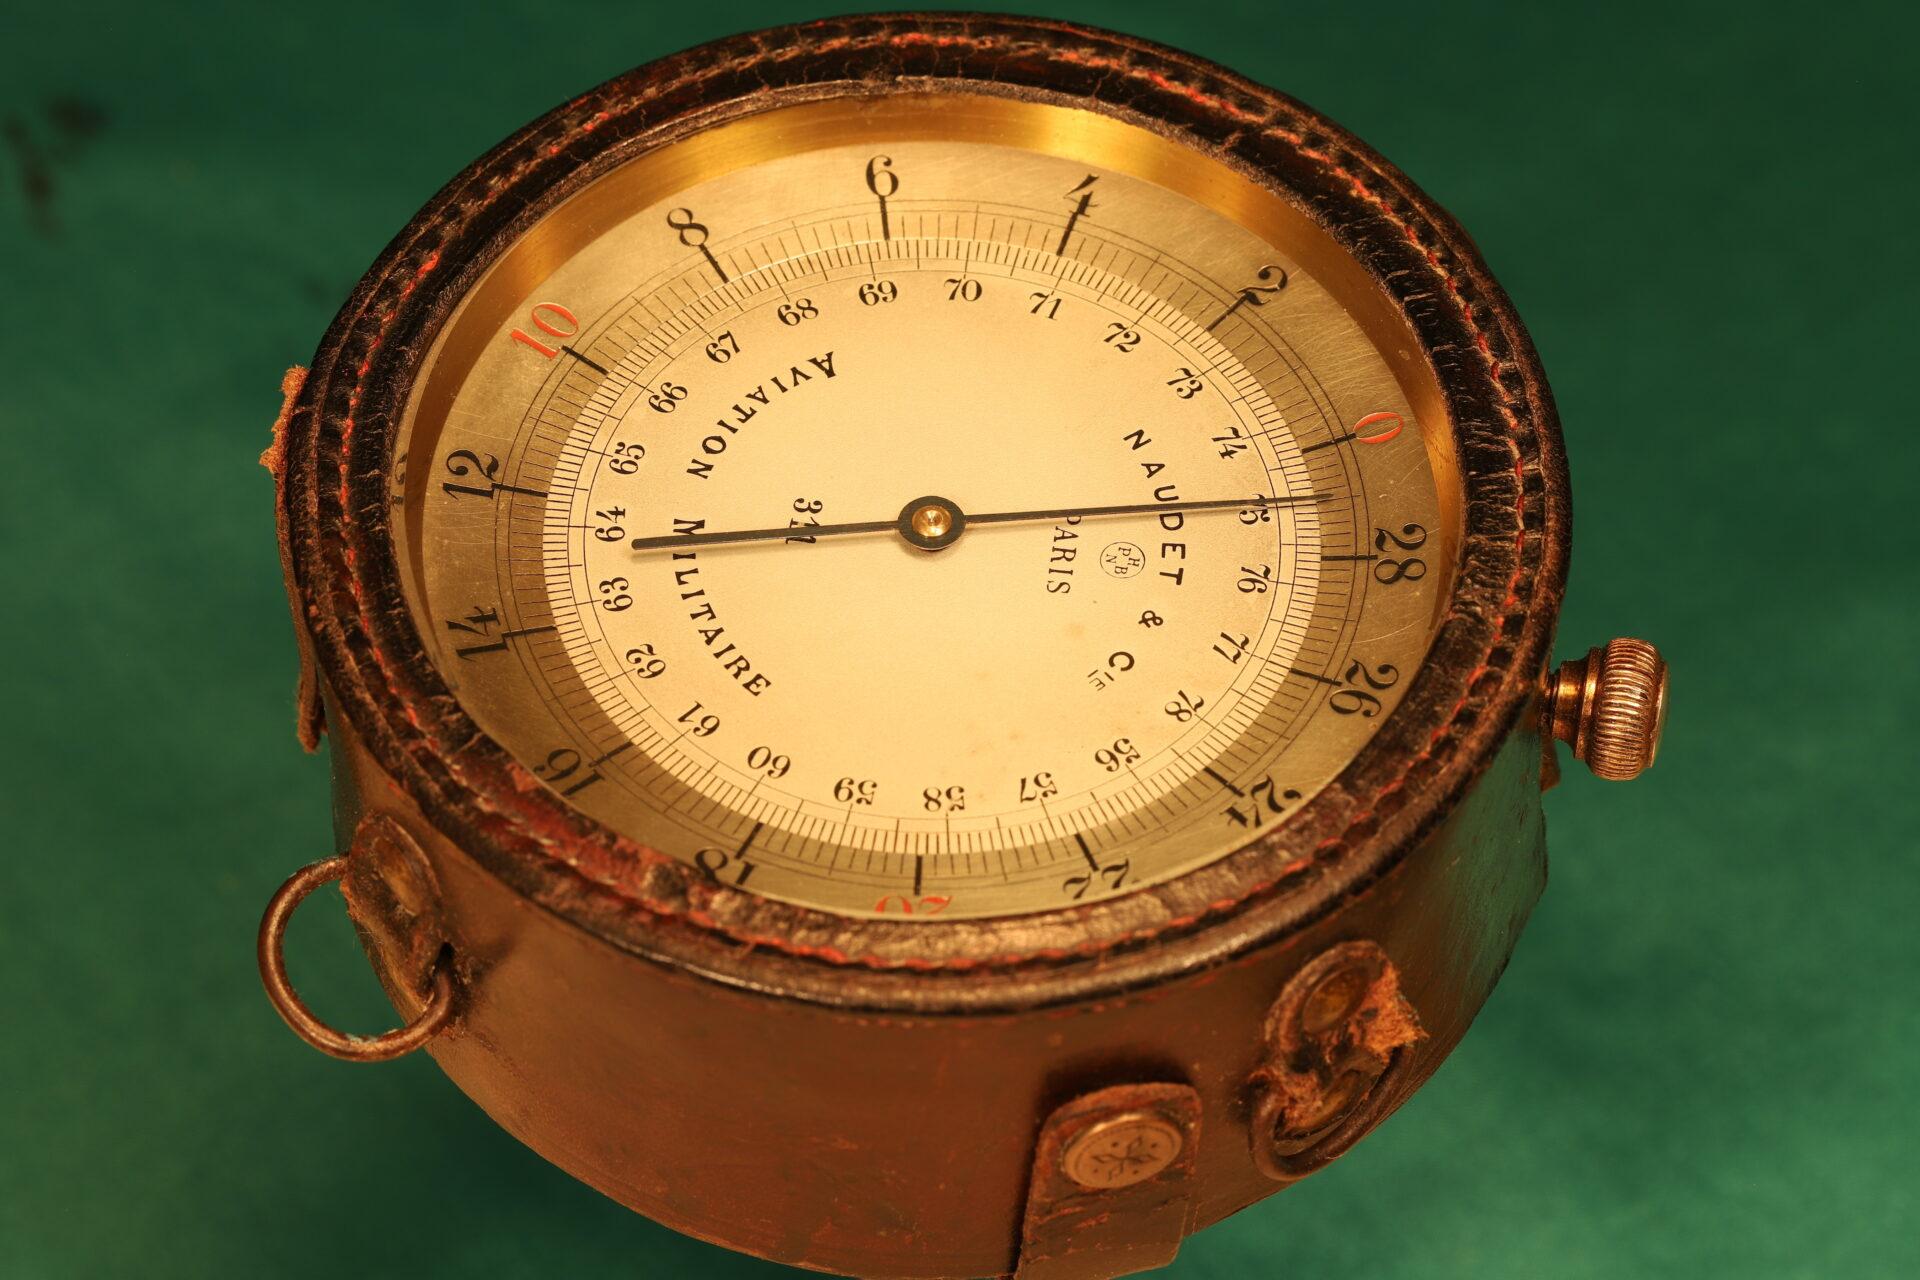 Image of Naudet WWI Aircraft Altimeter No 311 c1914 in flight case